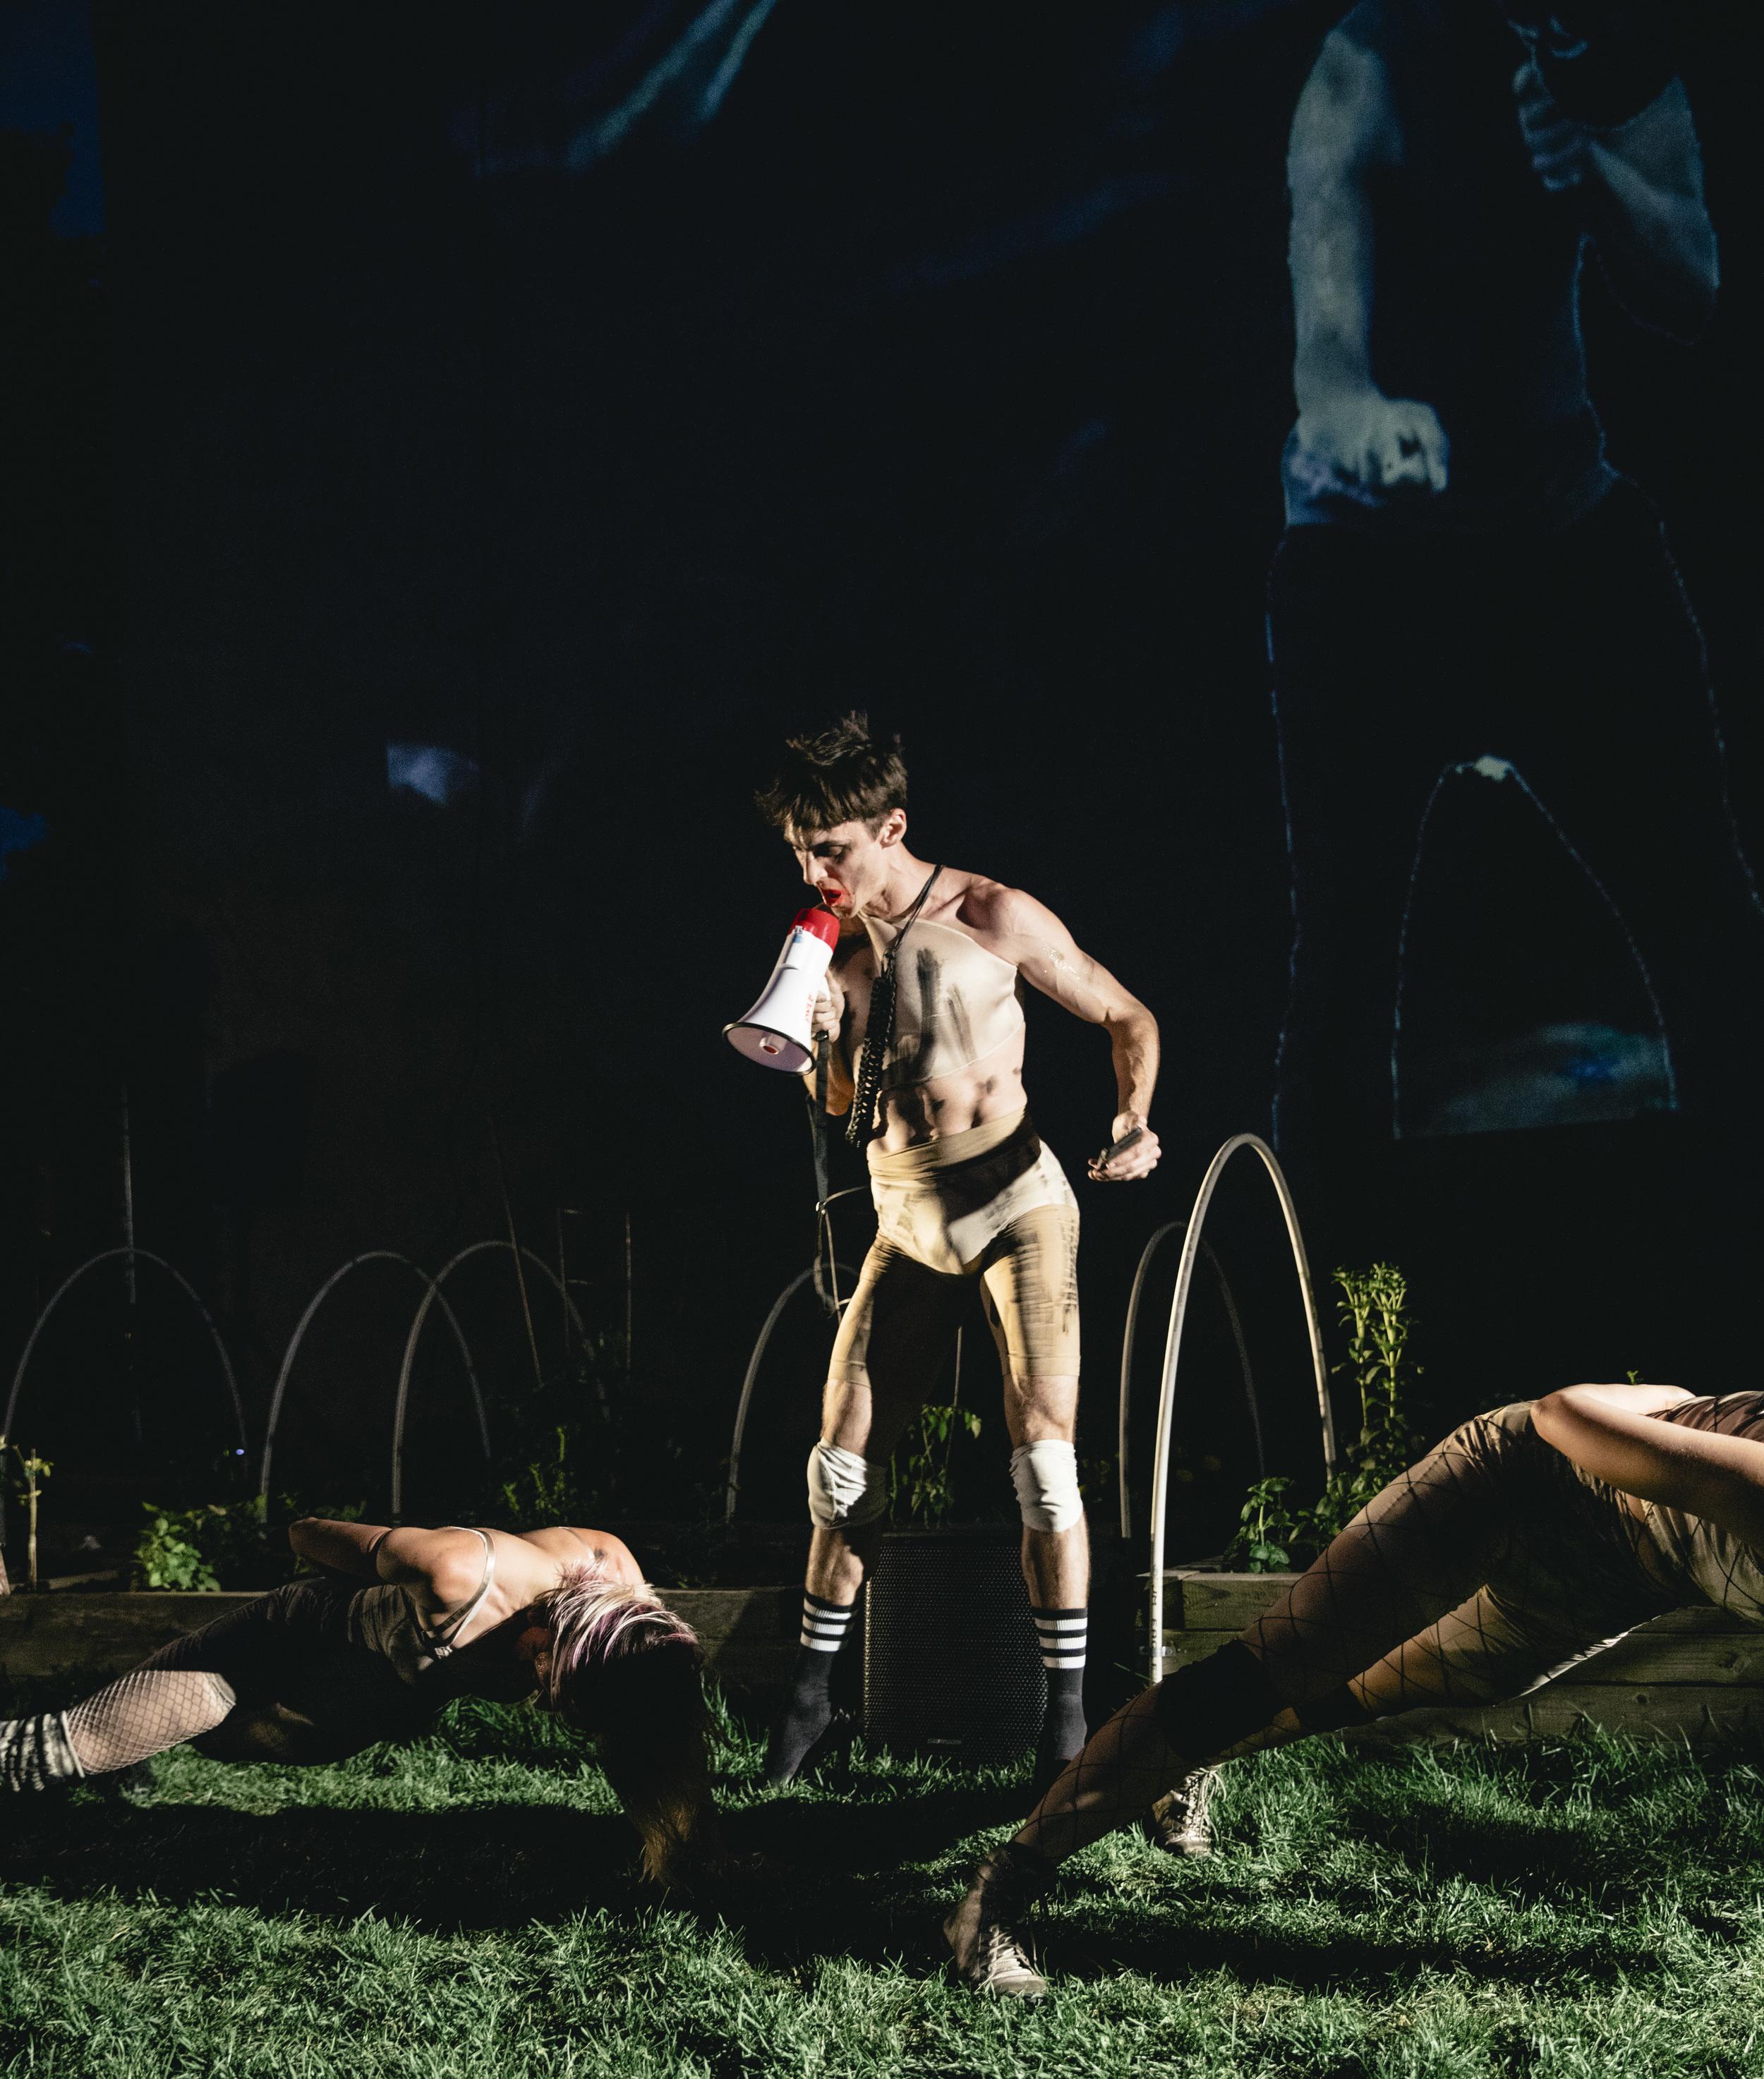 Company : The Dance Cartel  Choreography : Ani Taj Niemann  Video : Stivo Arnoczy  Costumes : Brad Callahan